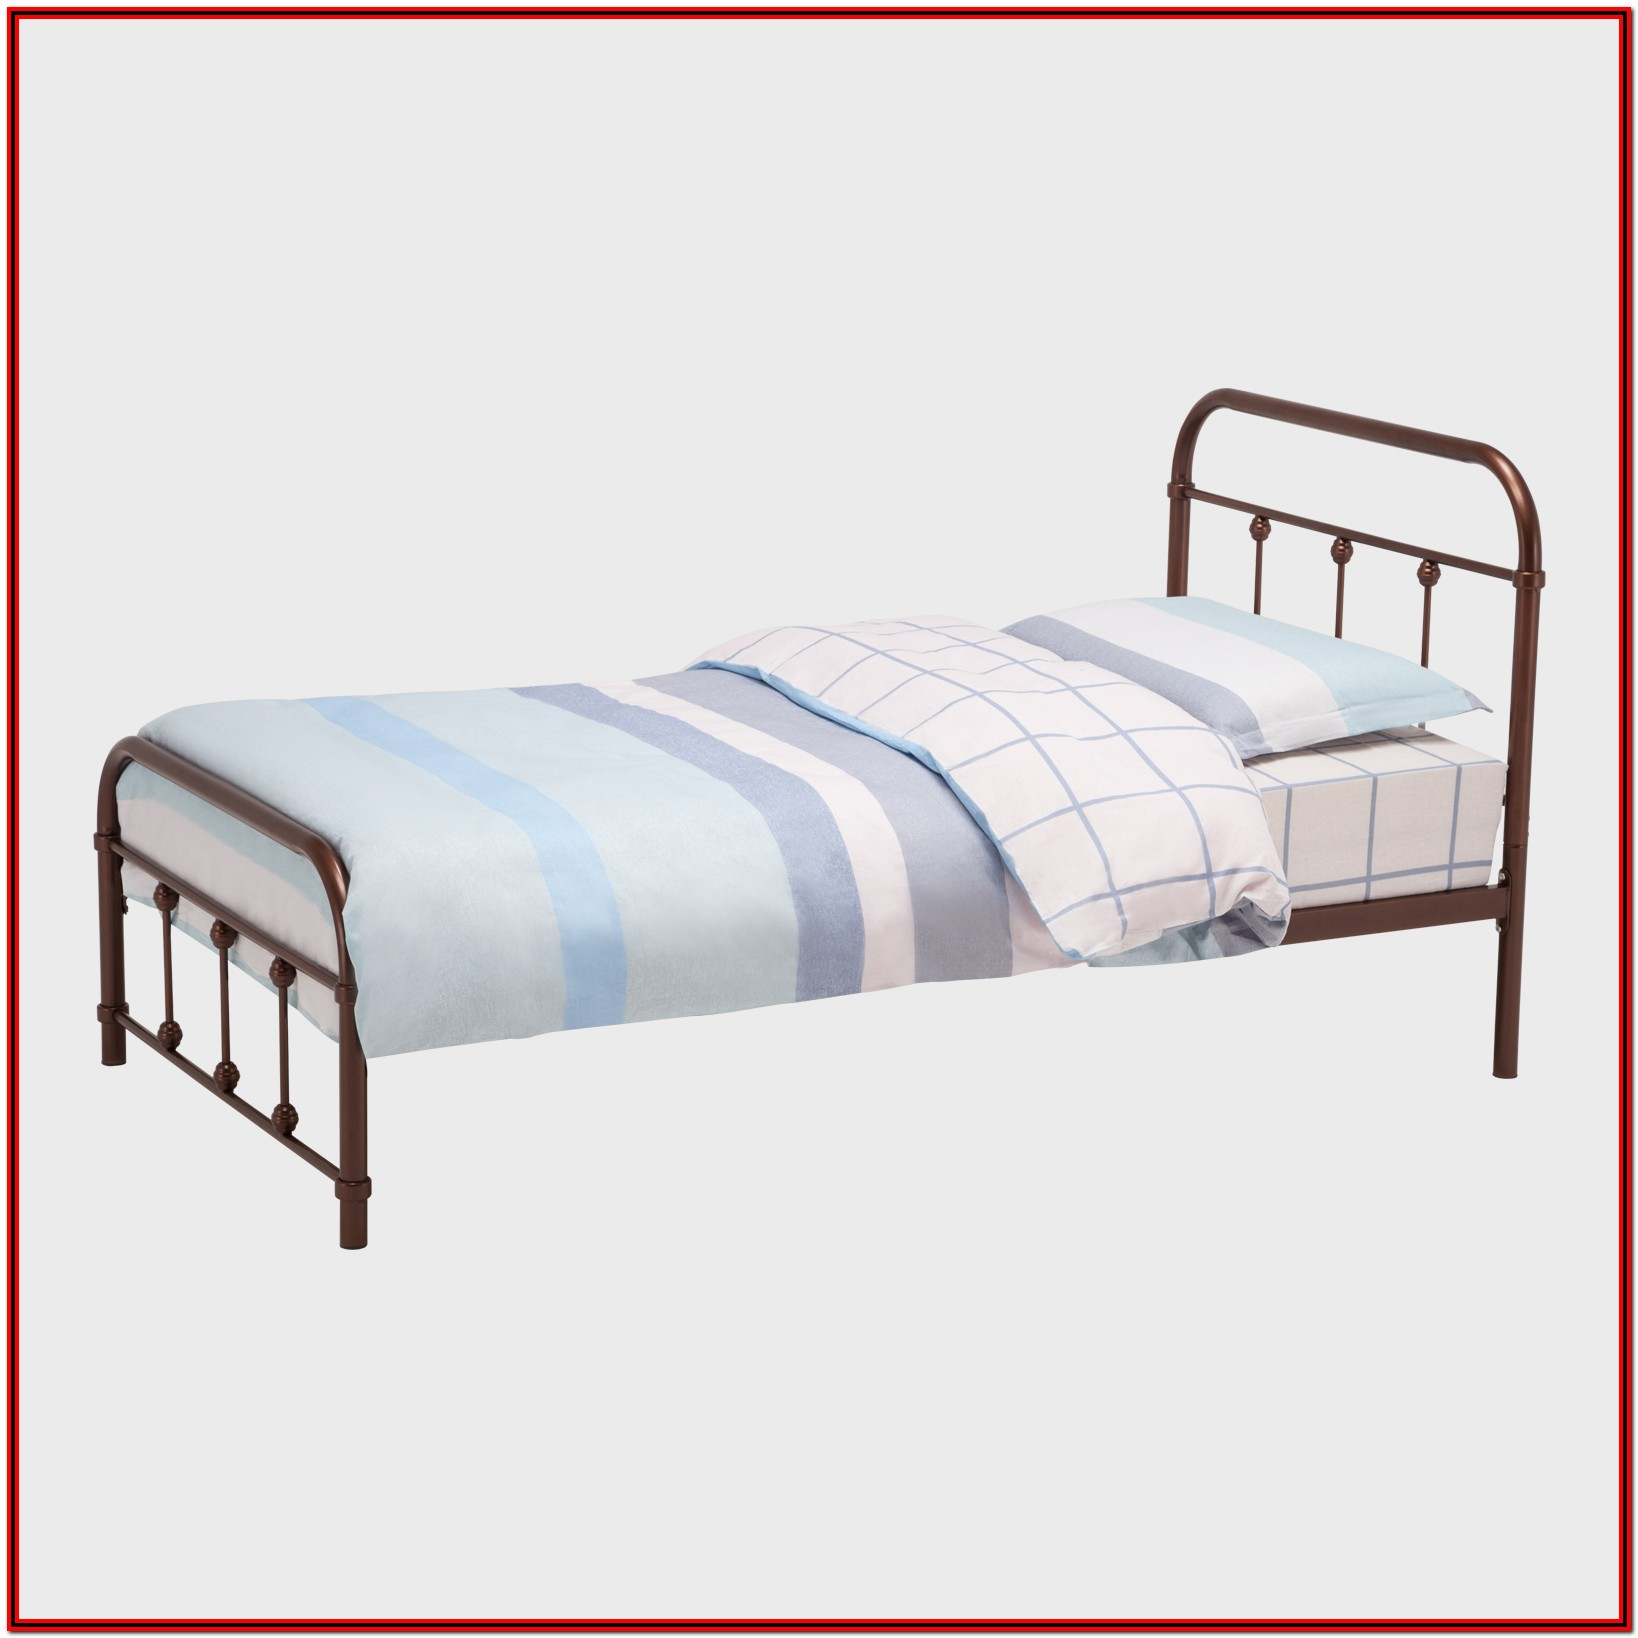 Bed Frame Full Headboard And Footboard